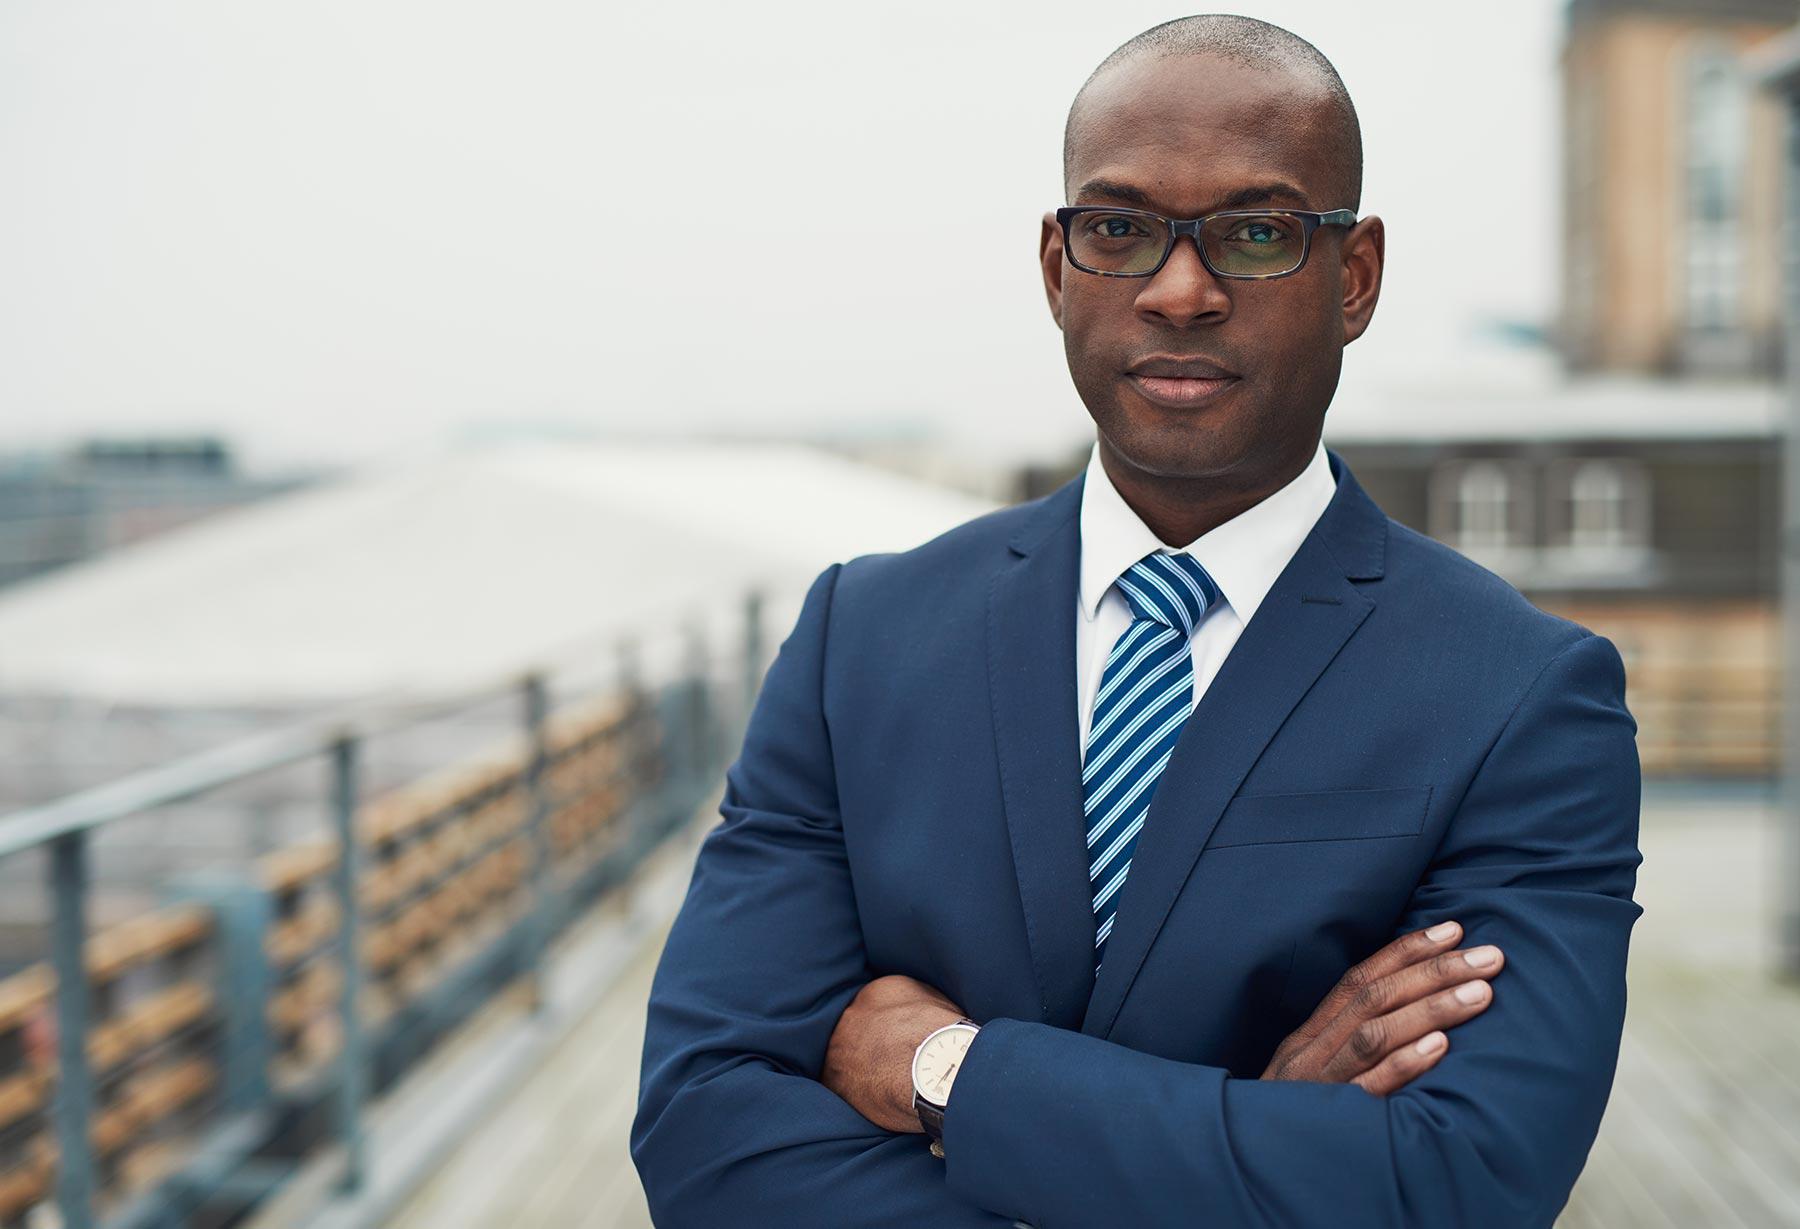 confident-black-business-man-PWQR35Y.jpg